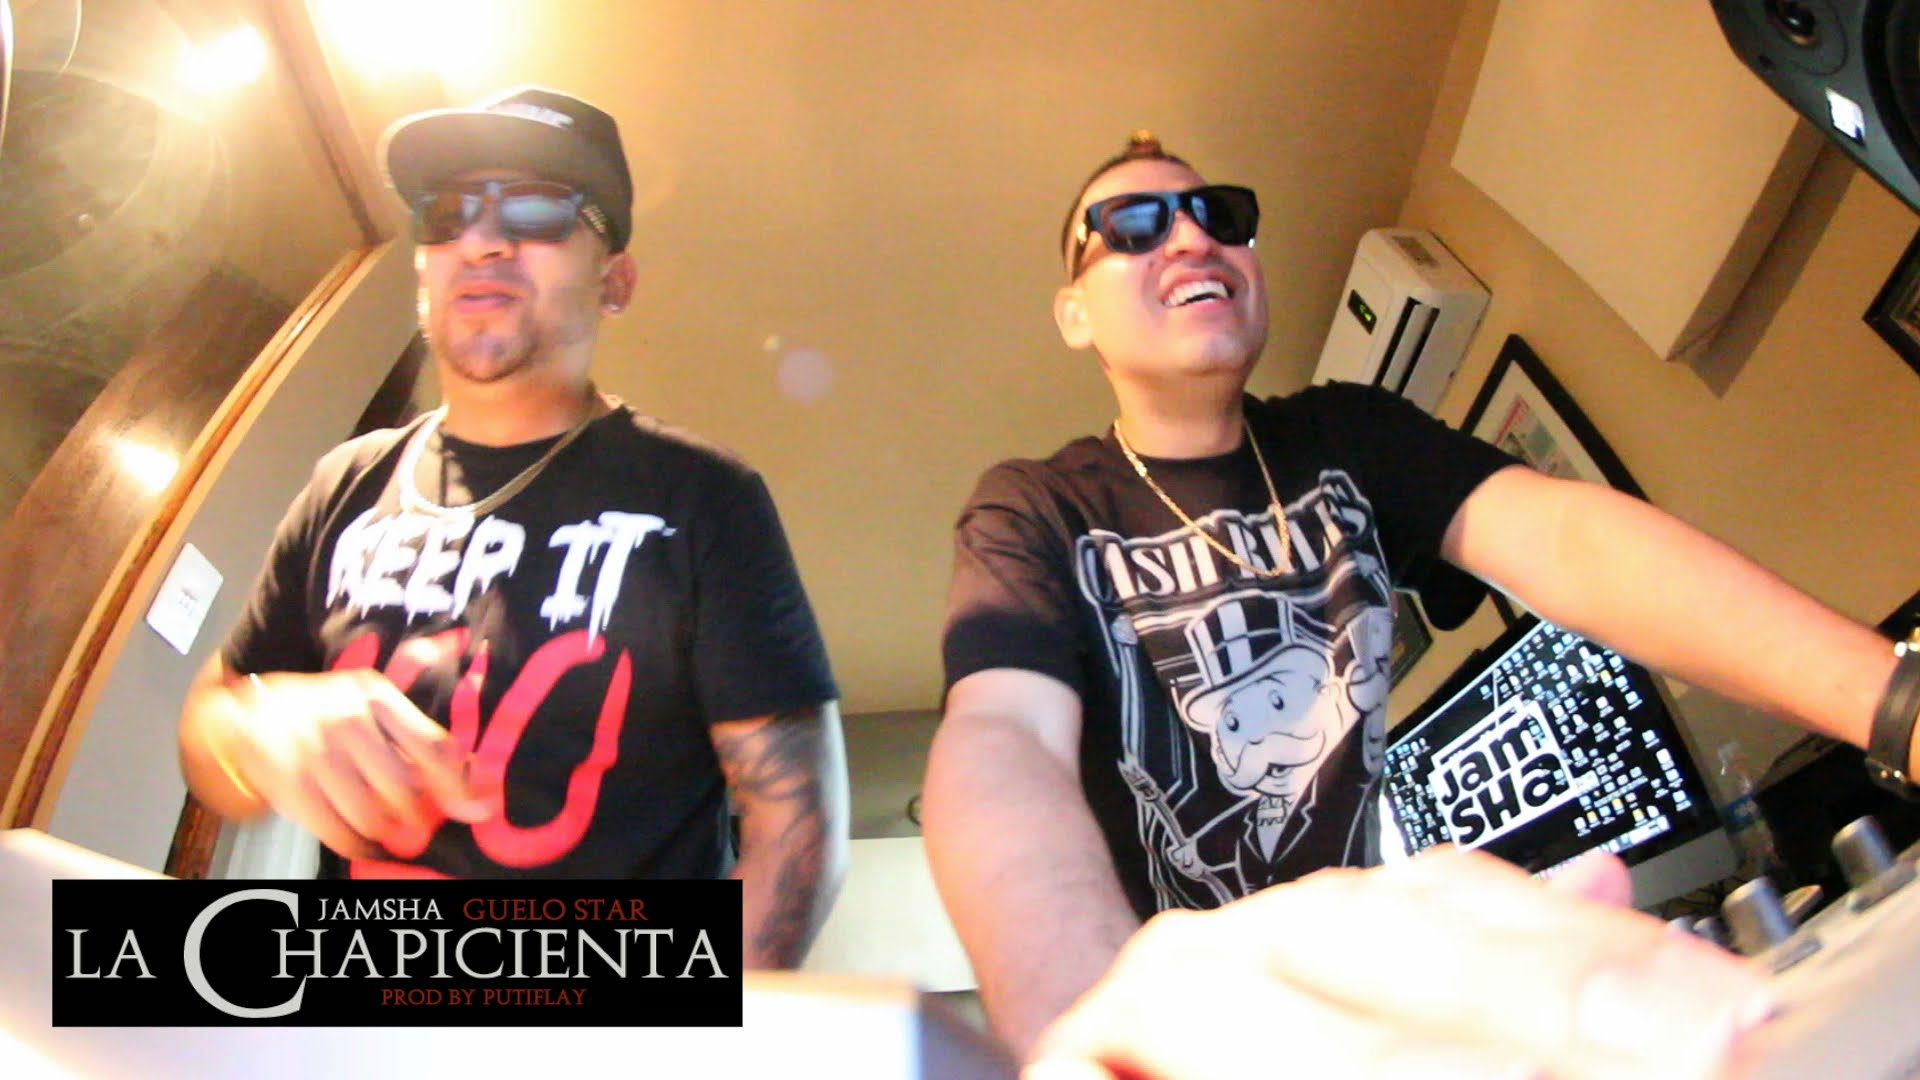 jamsha ft guelo star la chapicie - Jamsha Ft. Guelo Star – La Chapicienta (Preview)